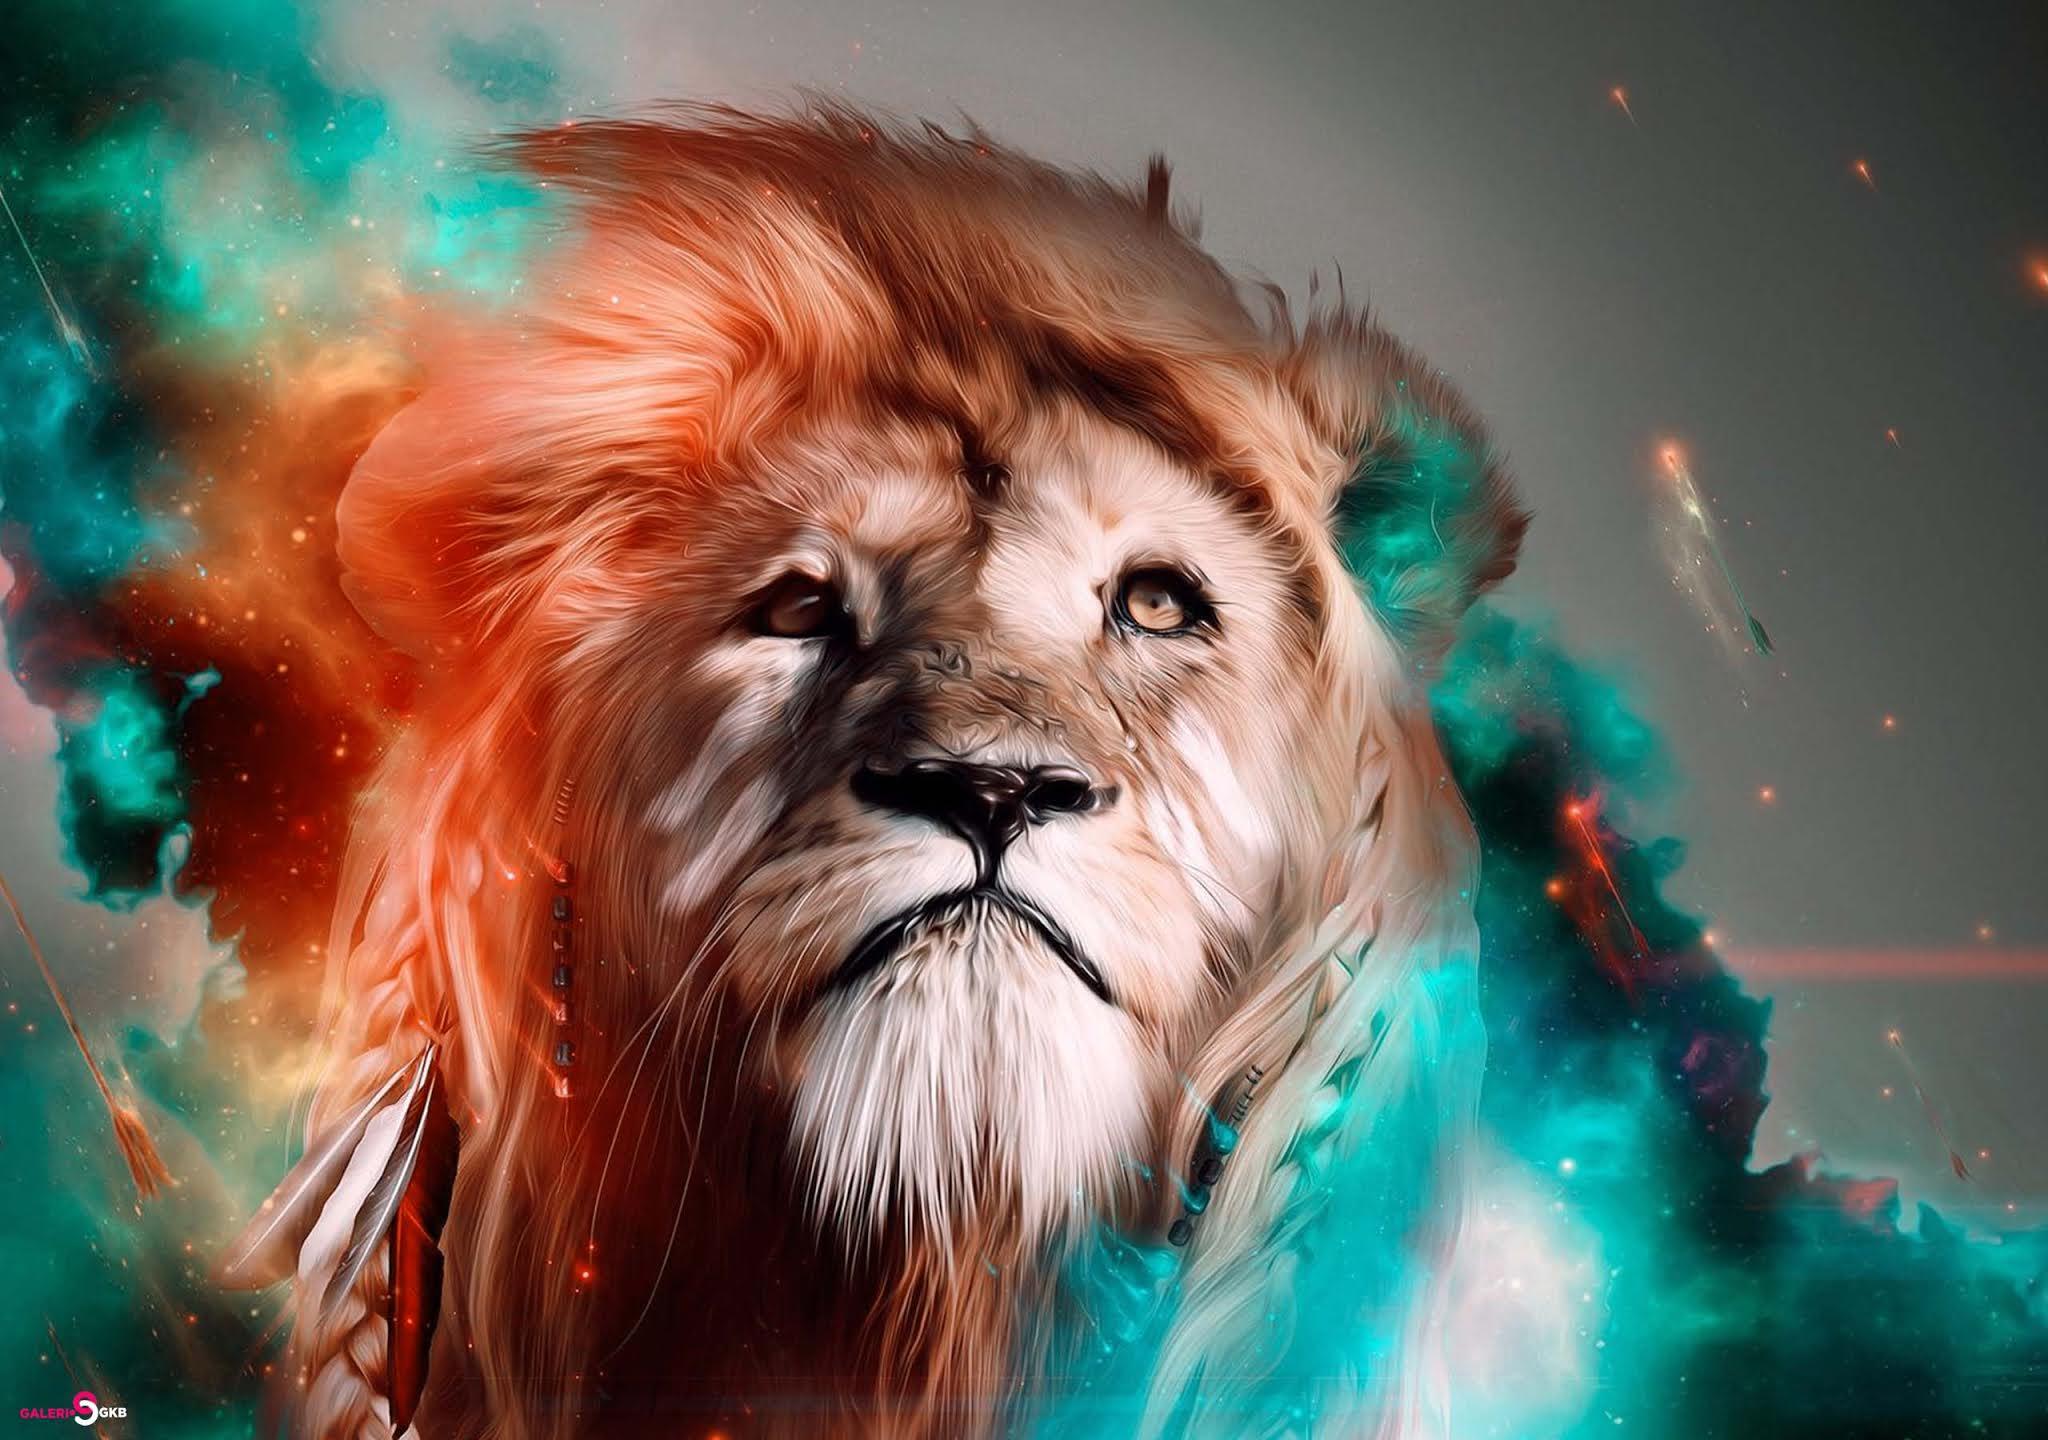 34 Grapich Lion Wallpaper HD, Lion Art Colorfull Wallpaper For Desktop PC